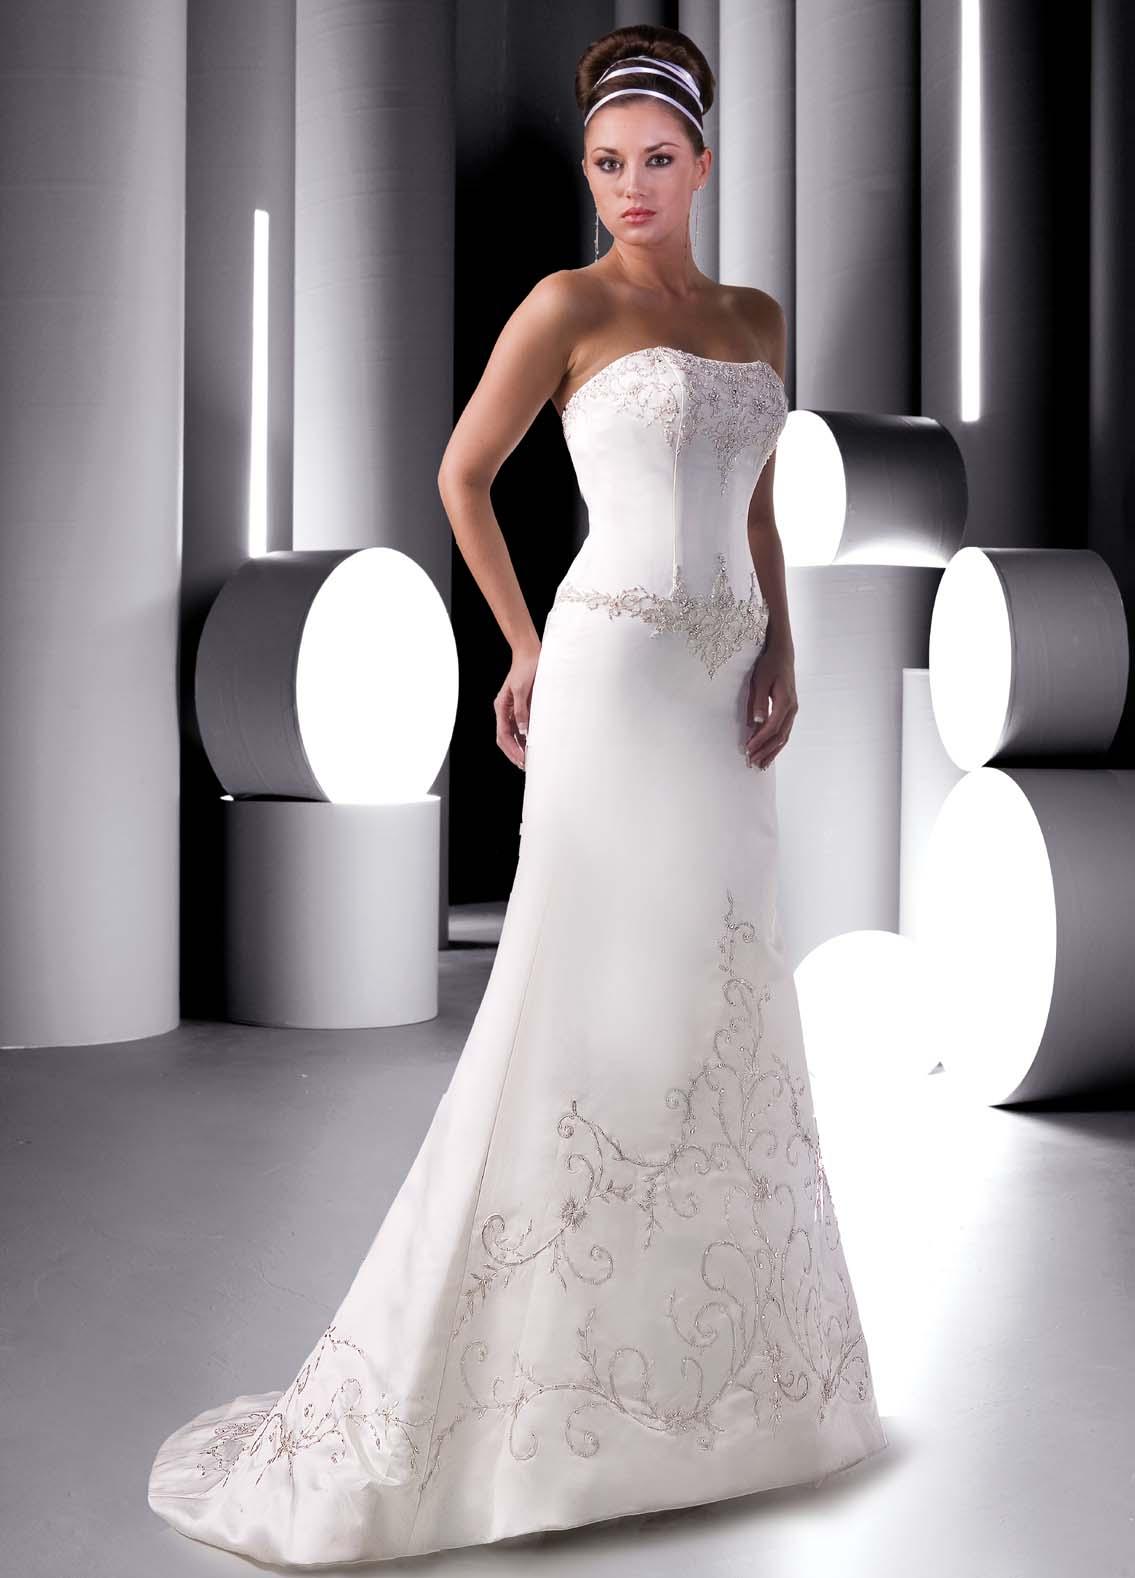 designer wedding dresses online online wedding dresses Designer Wedding Dresses Online